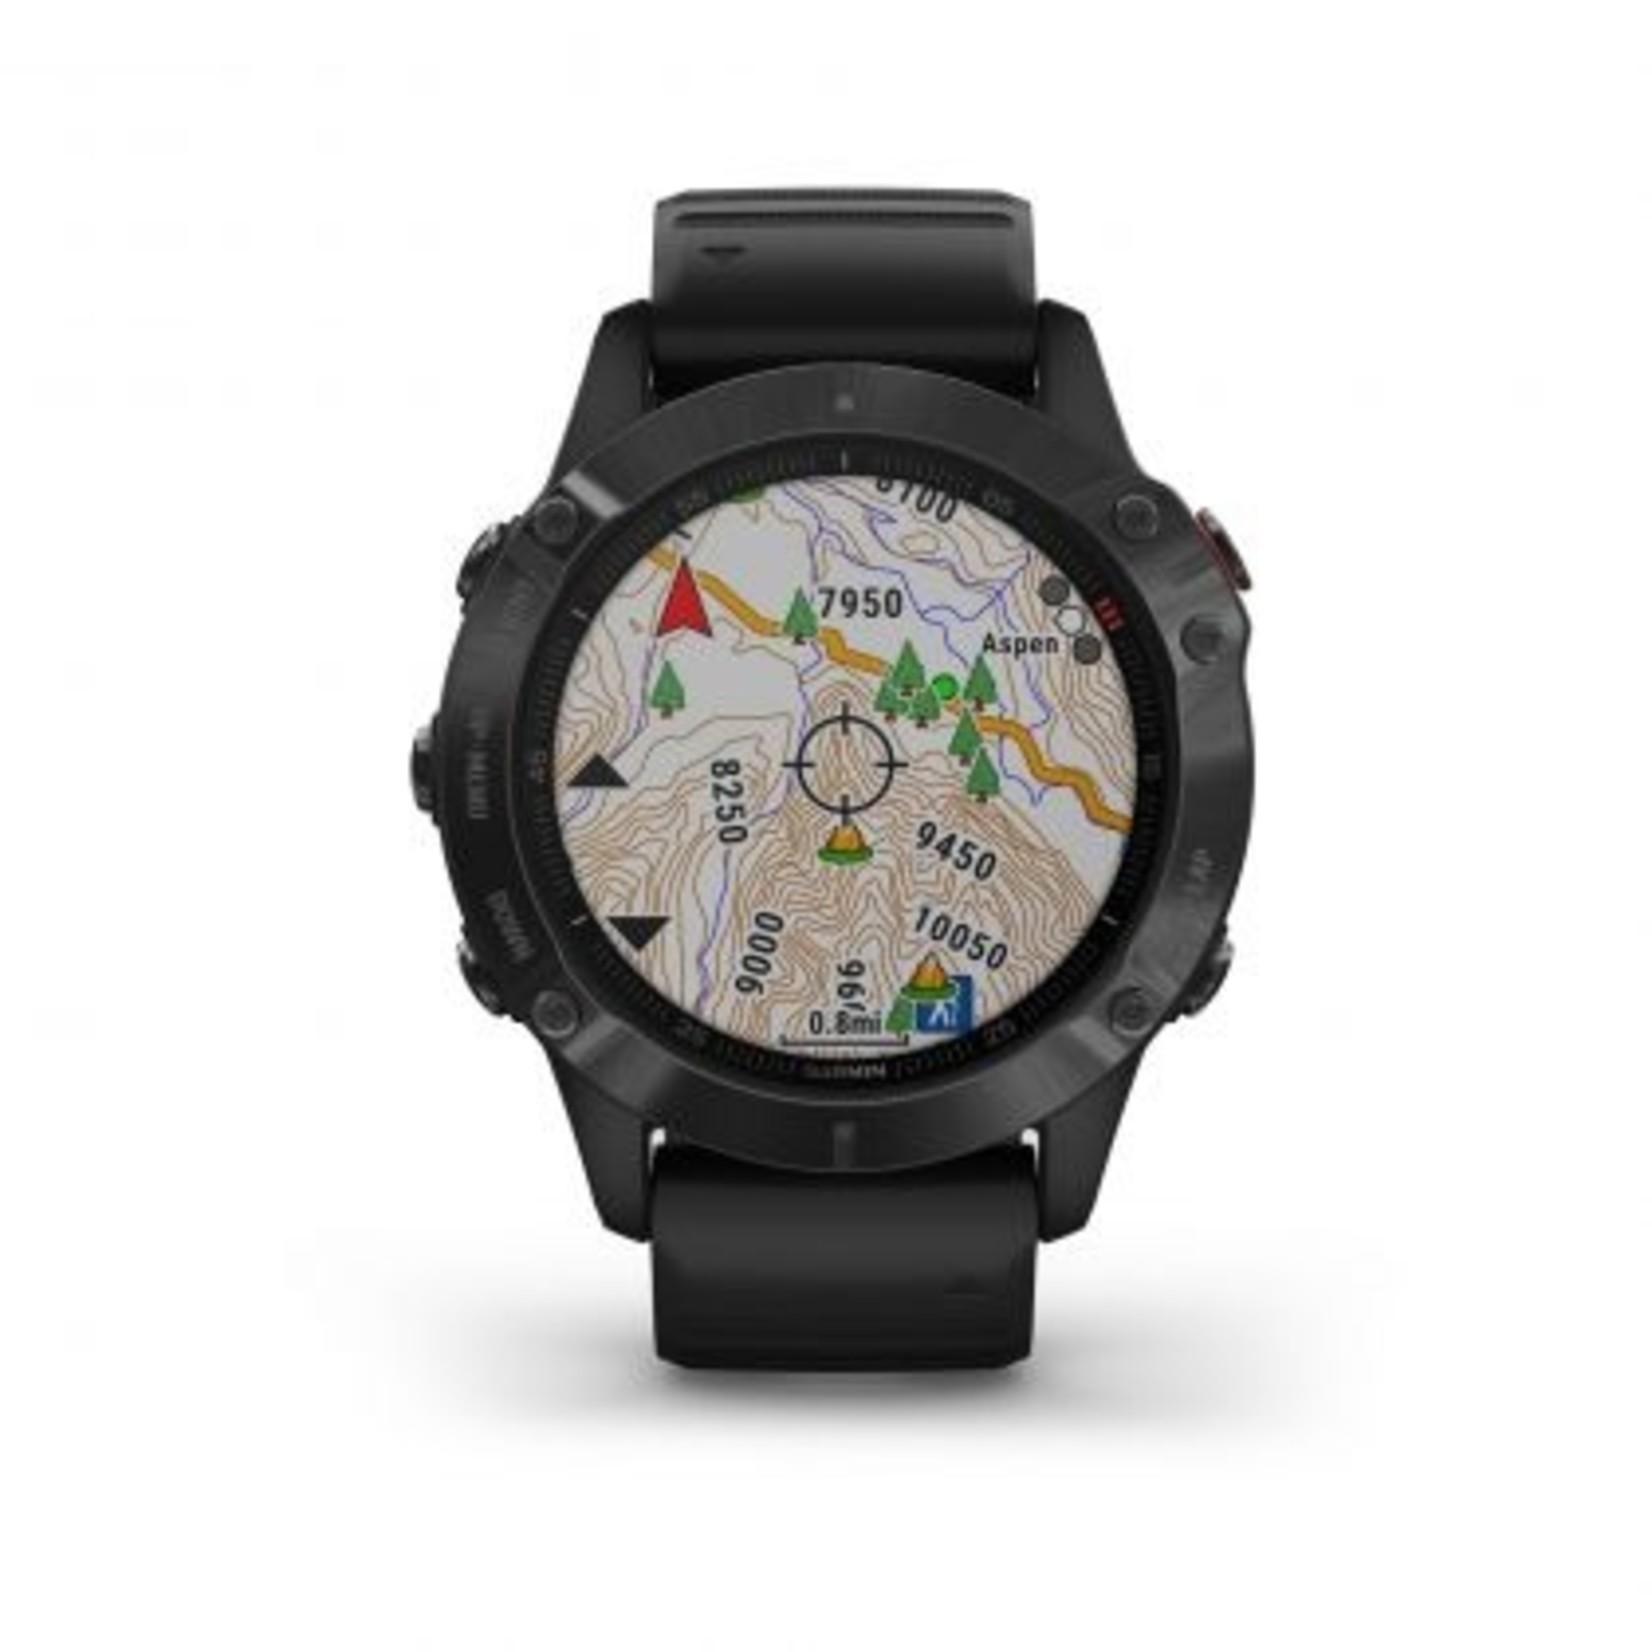 Garmin fēnix® 6 Sapphire - Carbon Gray DLC with Black Band